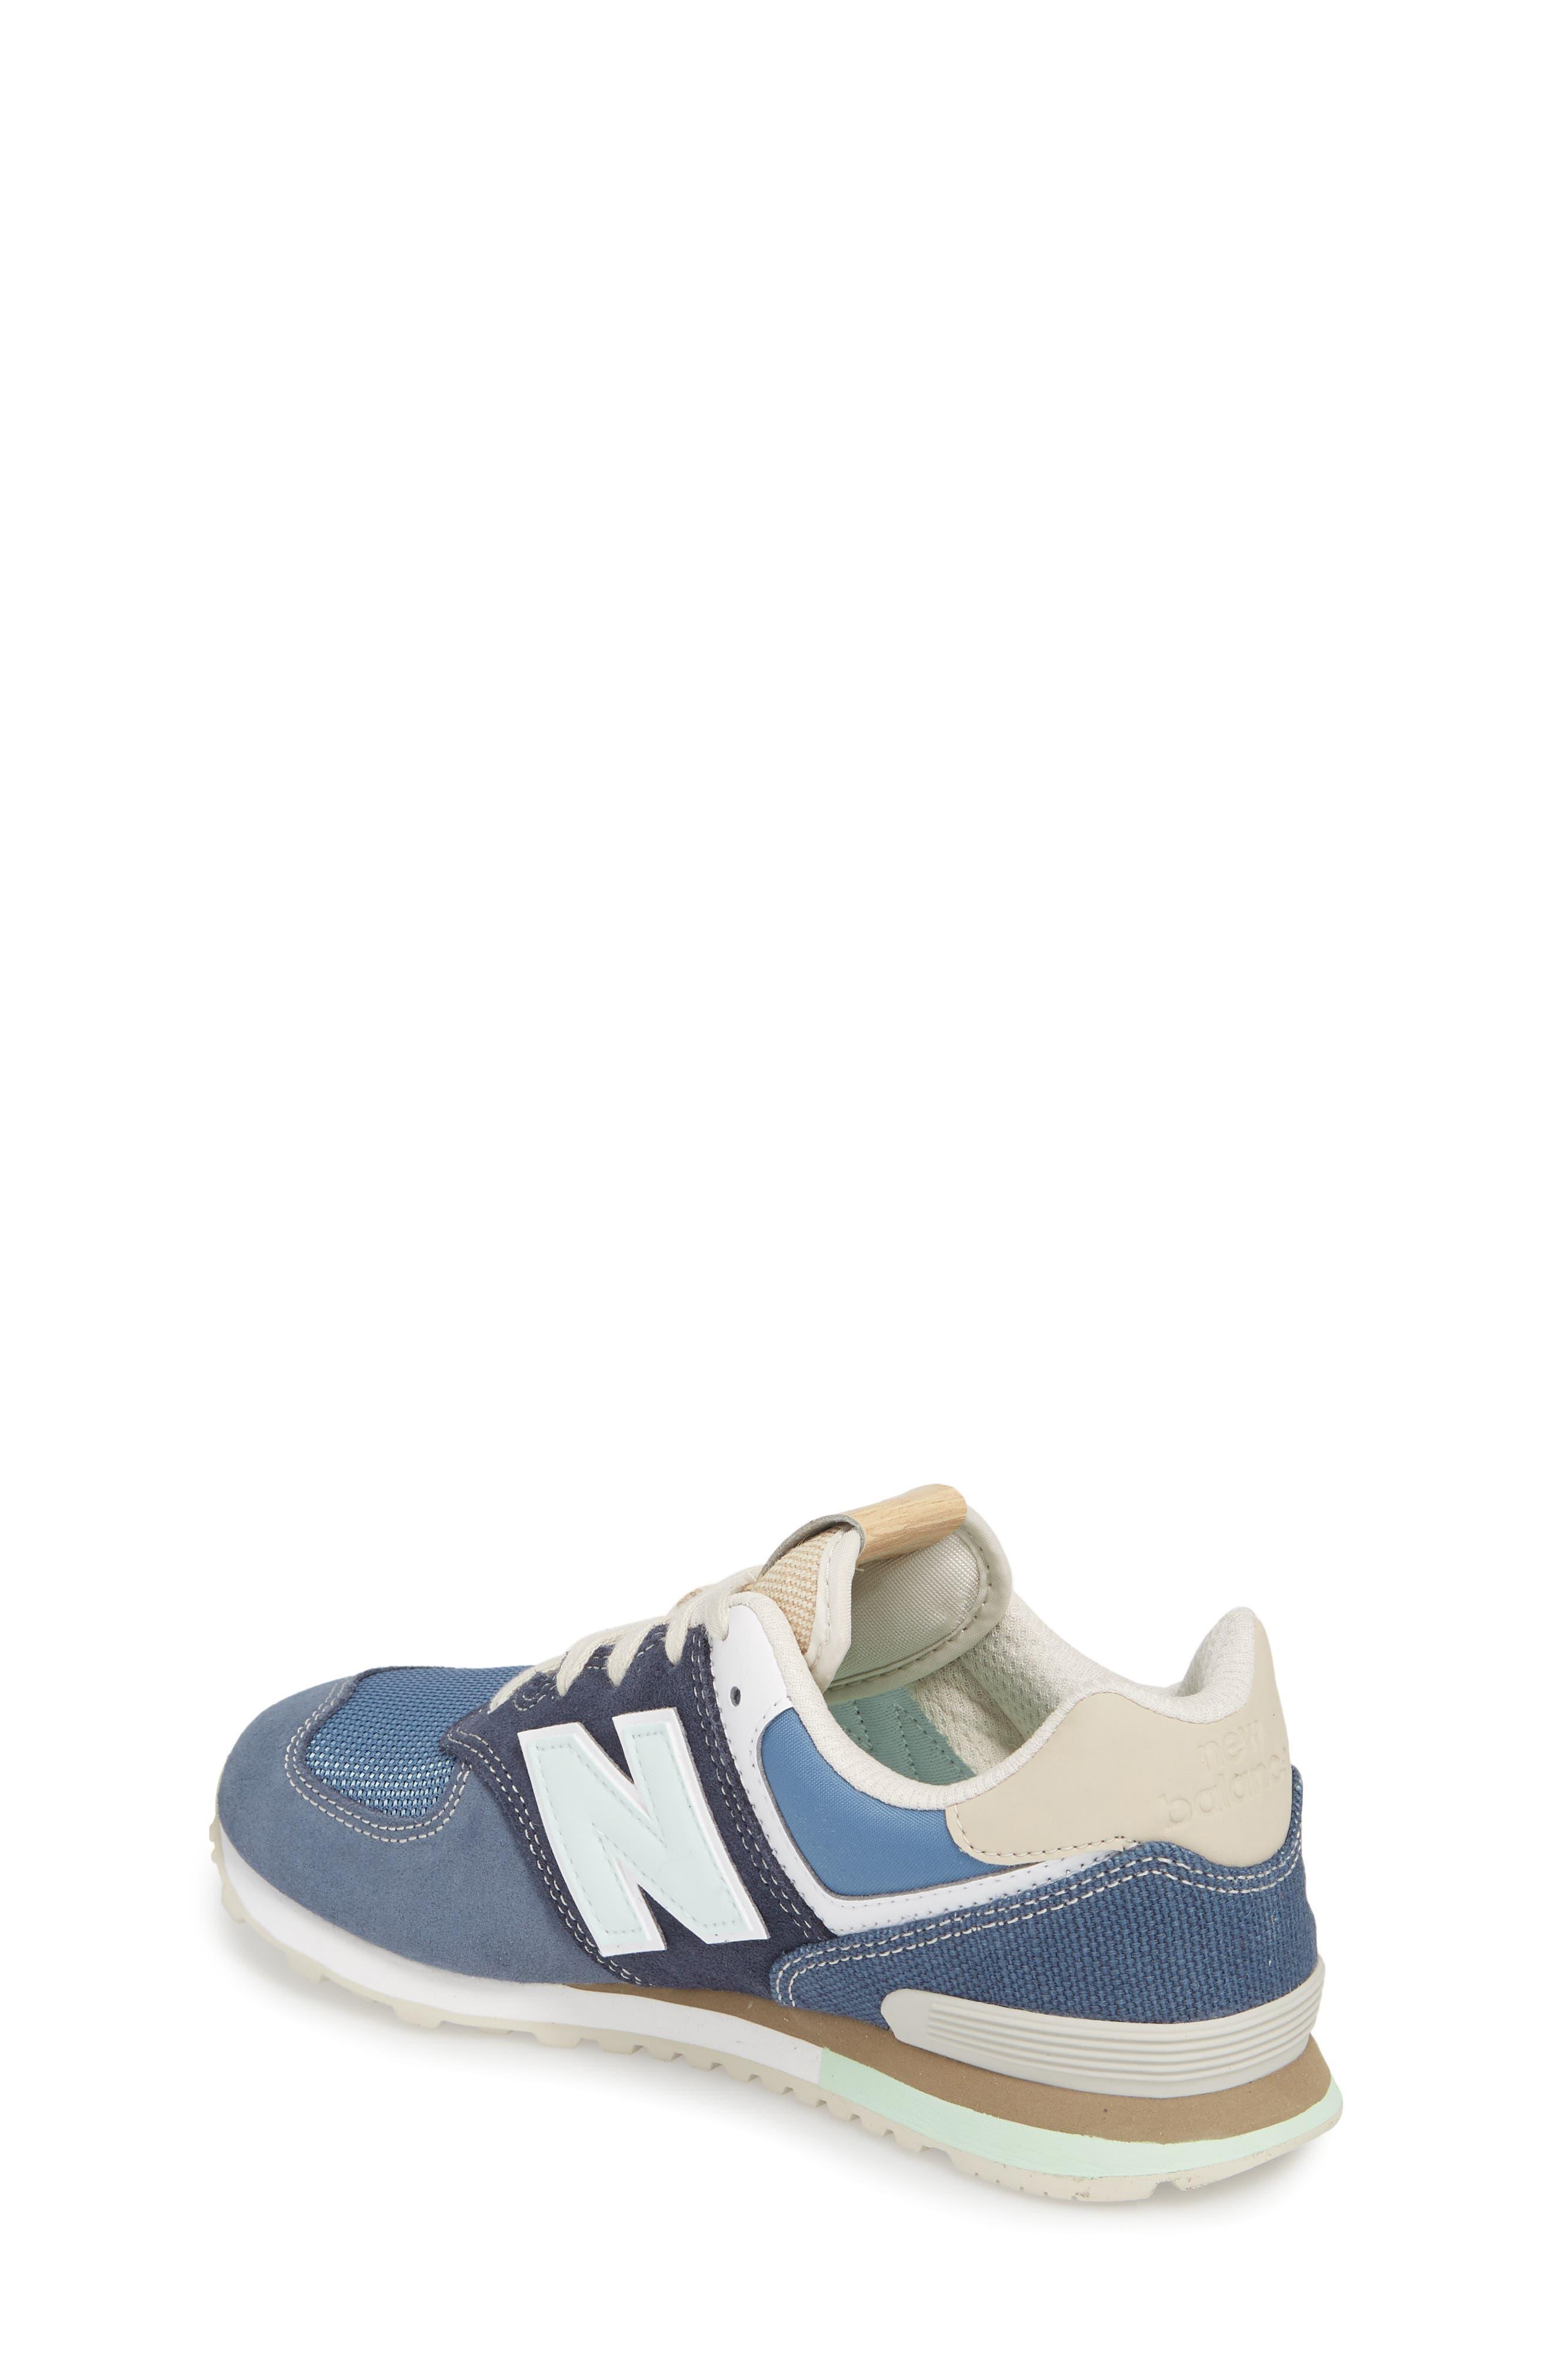 574 Retro Surf Sneaker,                             Alternate thumbnail 2, color,